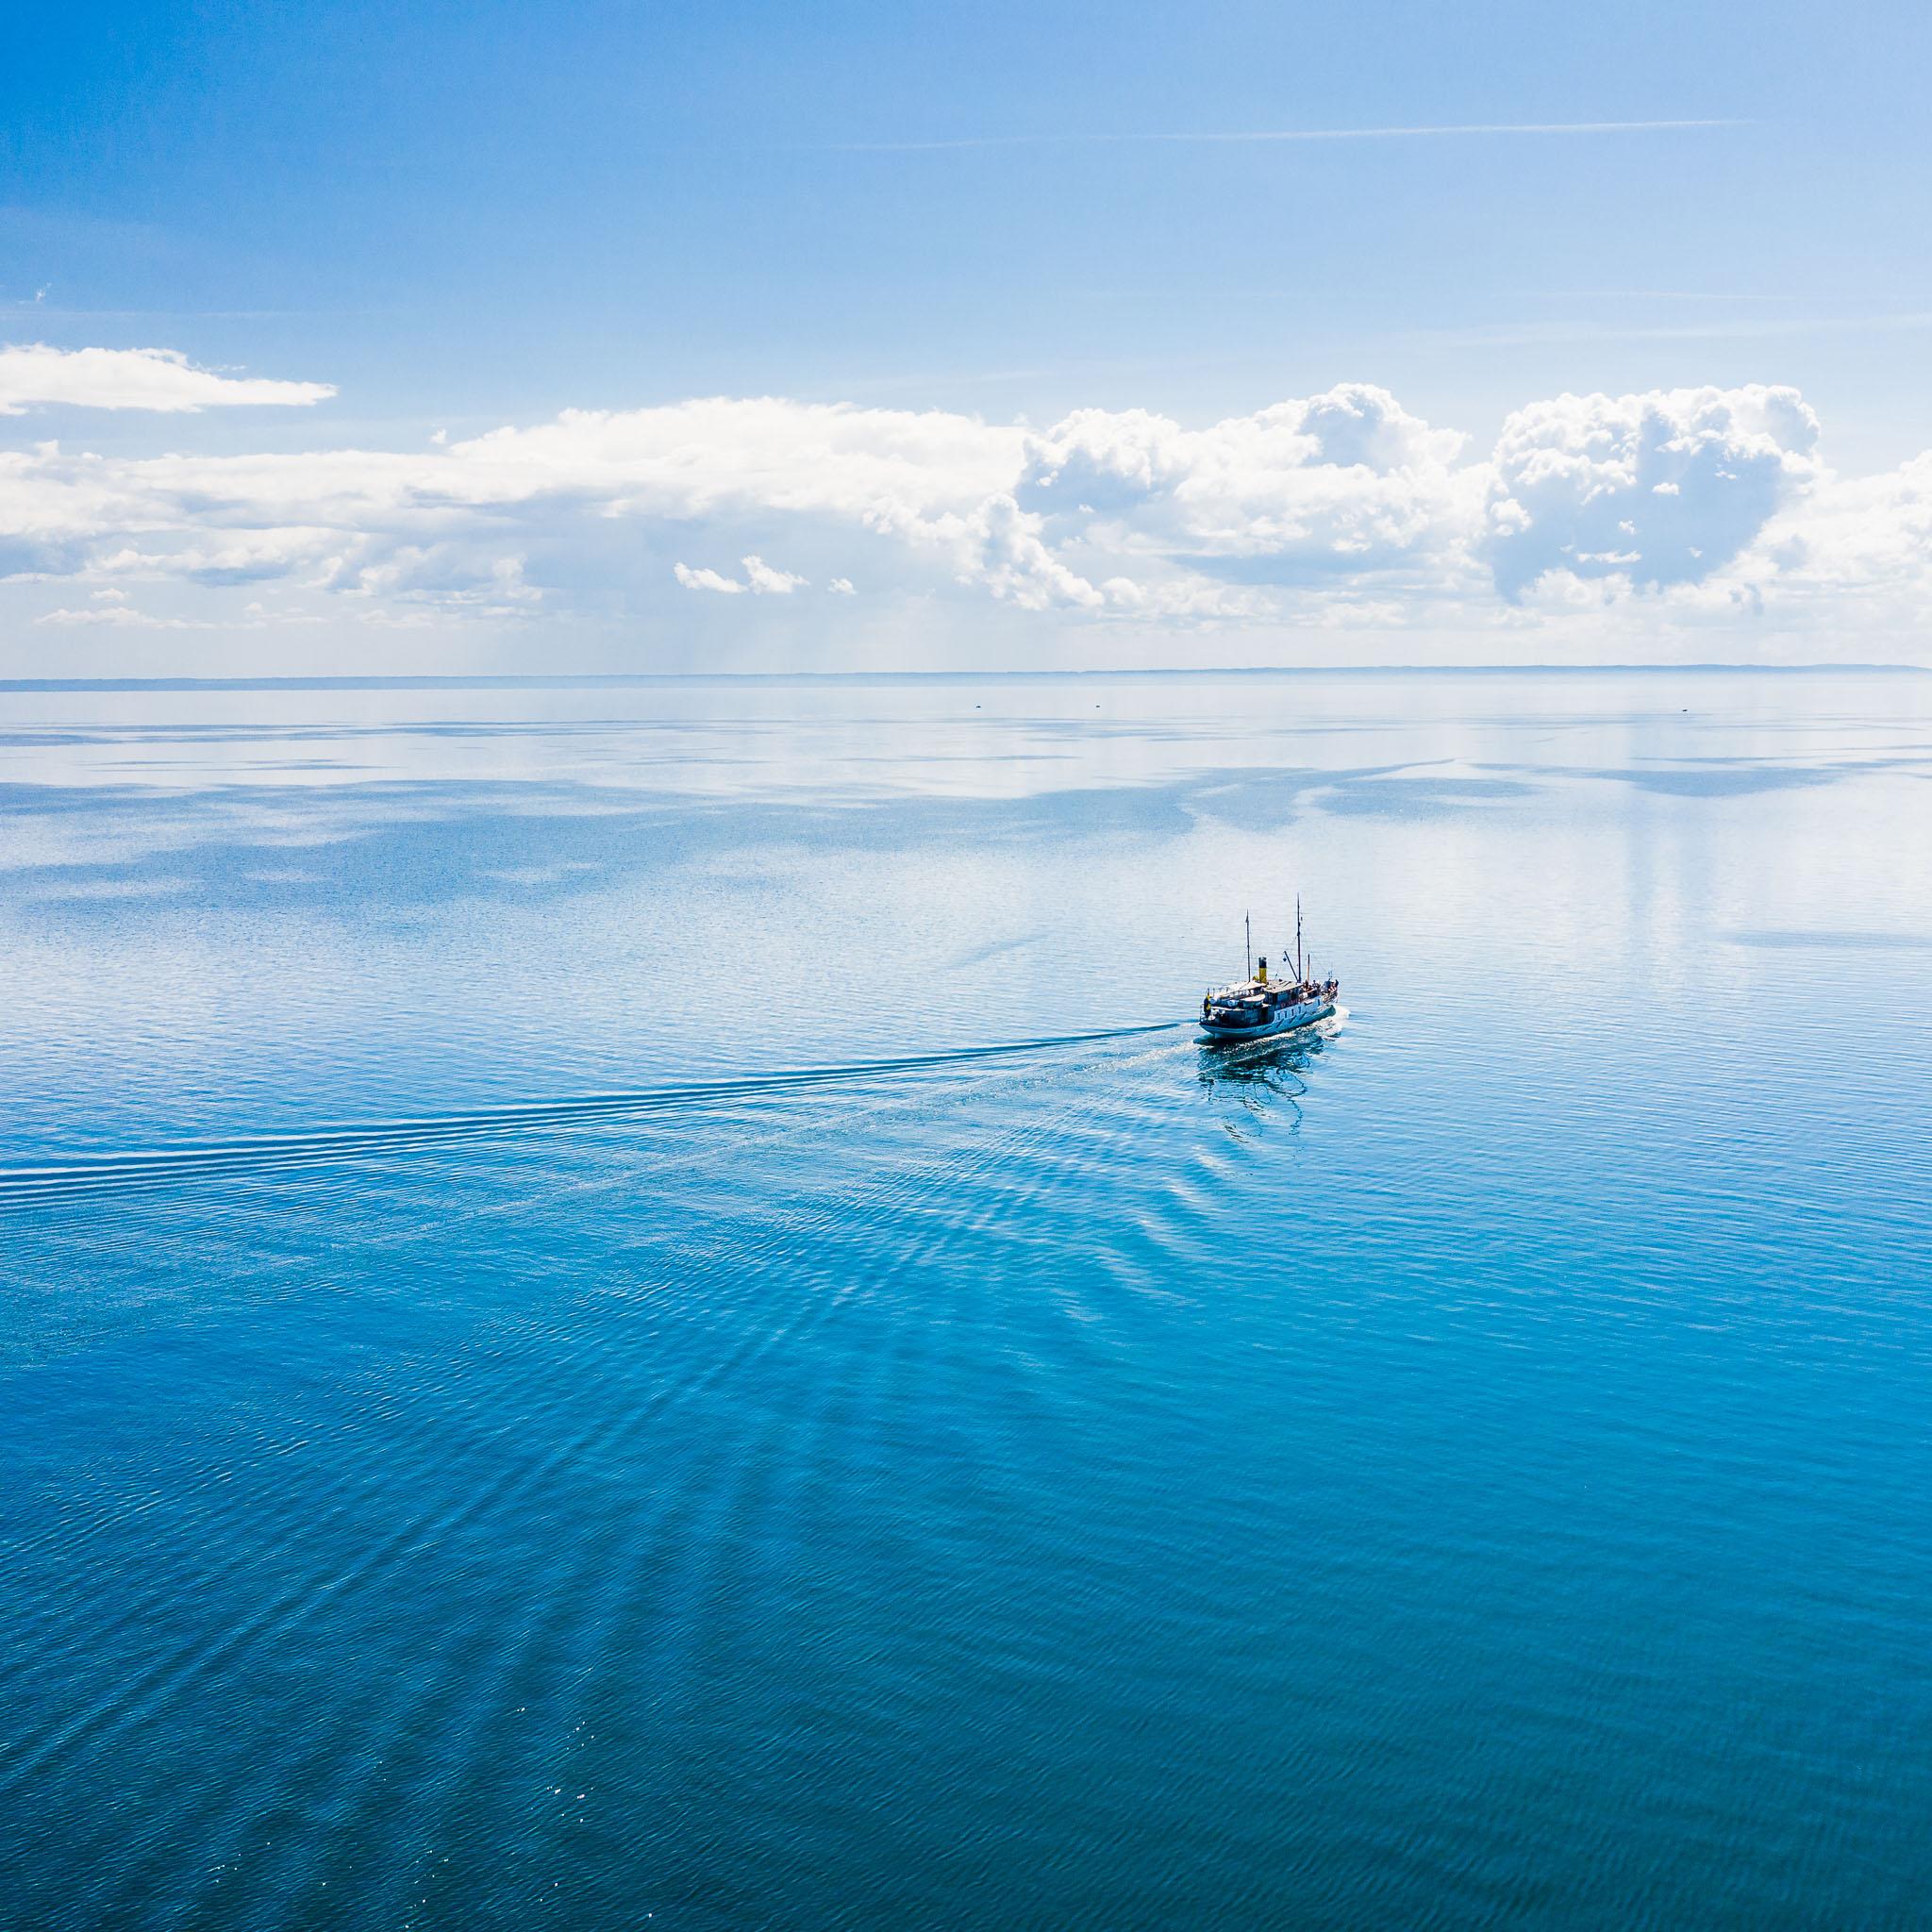 steamboat-ss-trafik-angbat-hjo-sweden-sverige-lake-vattern